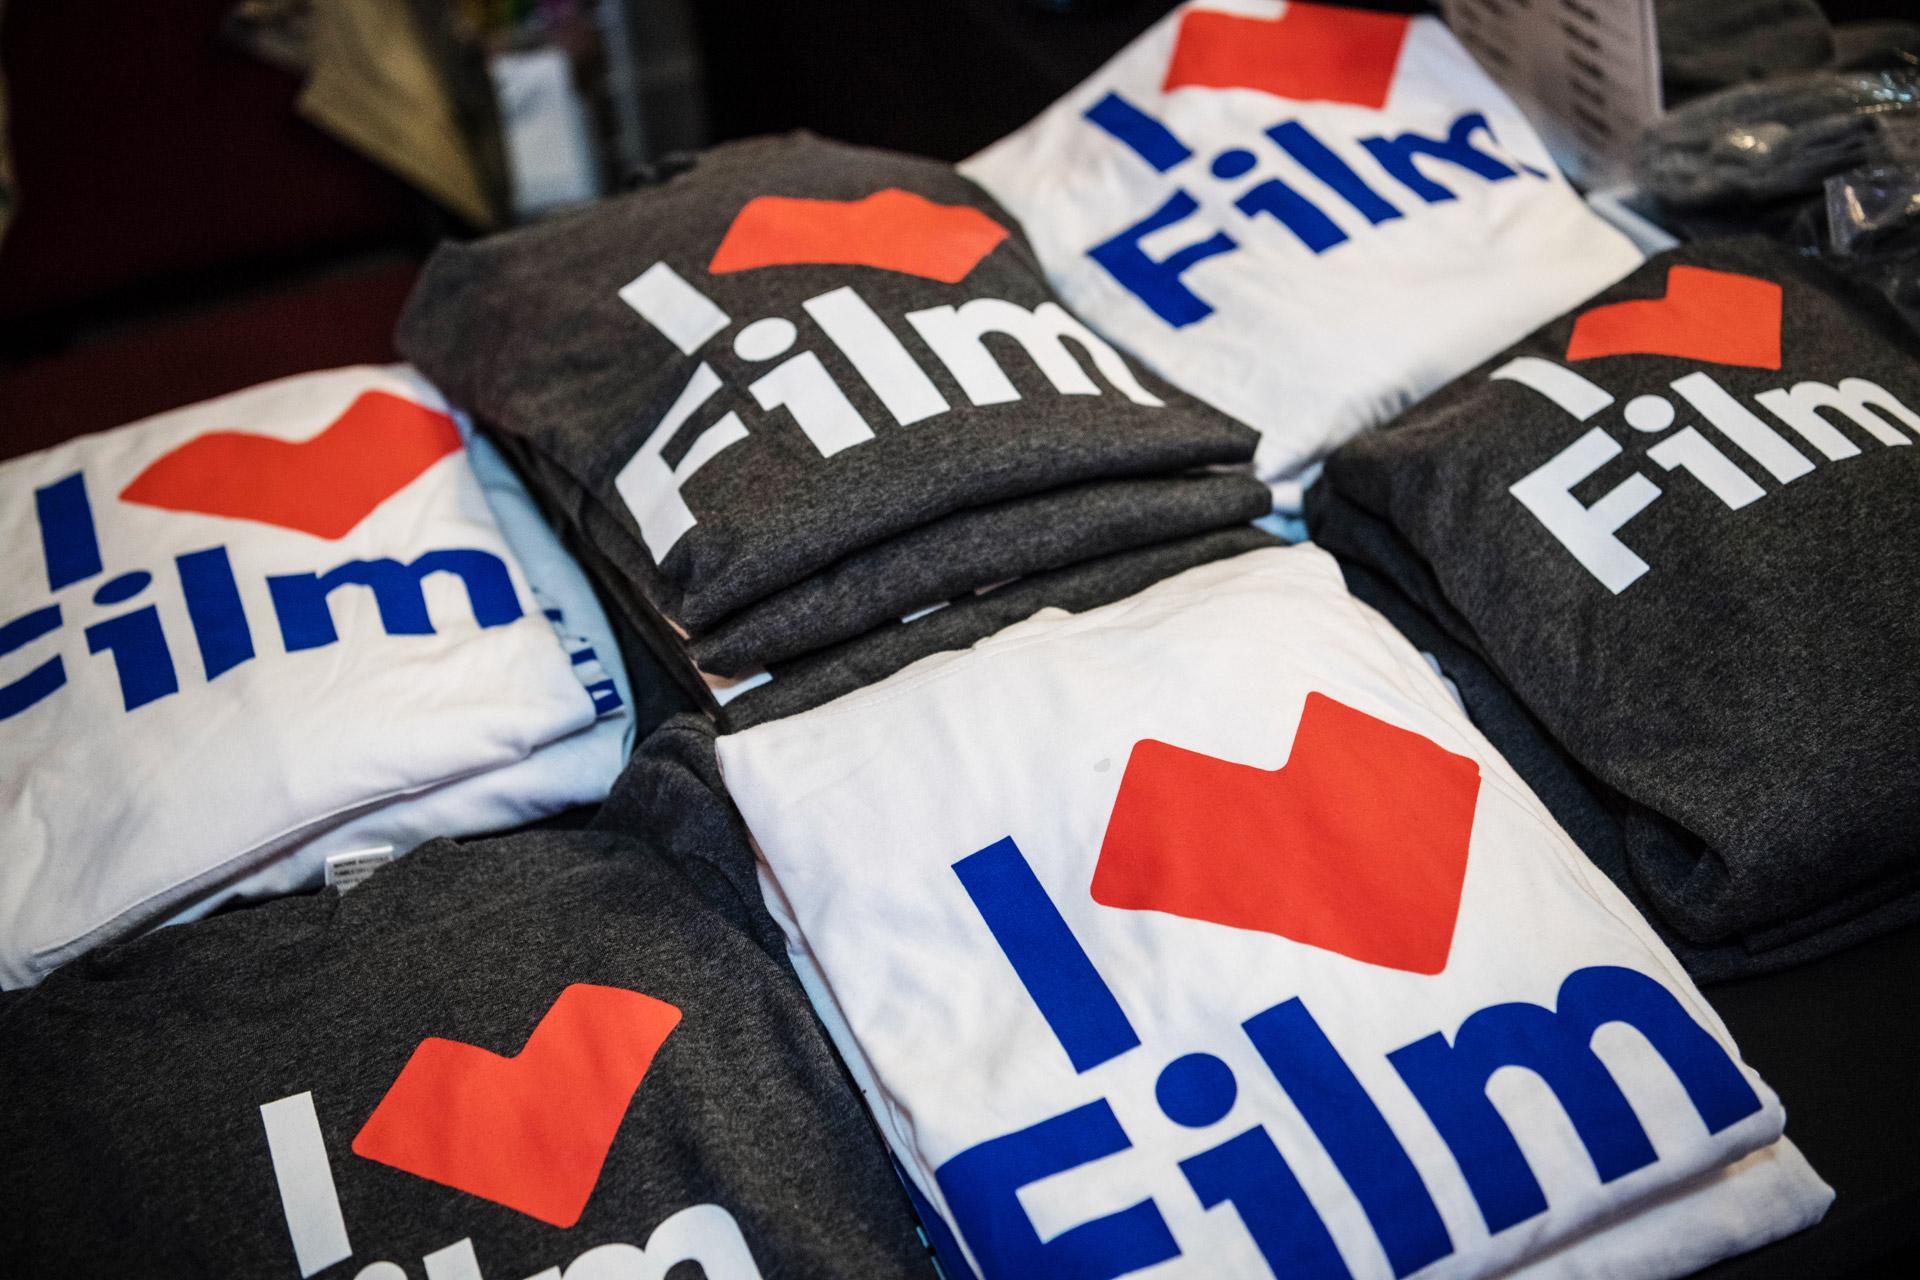 HIERONYMUS_MontclairFilm-IHeartFilmsShirts